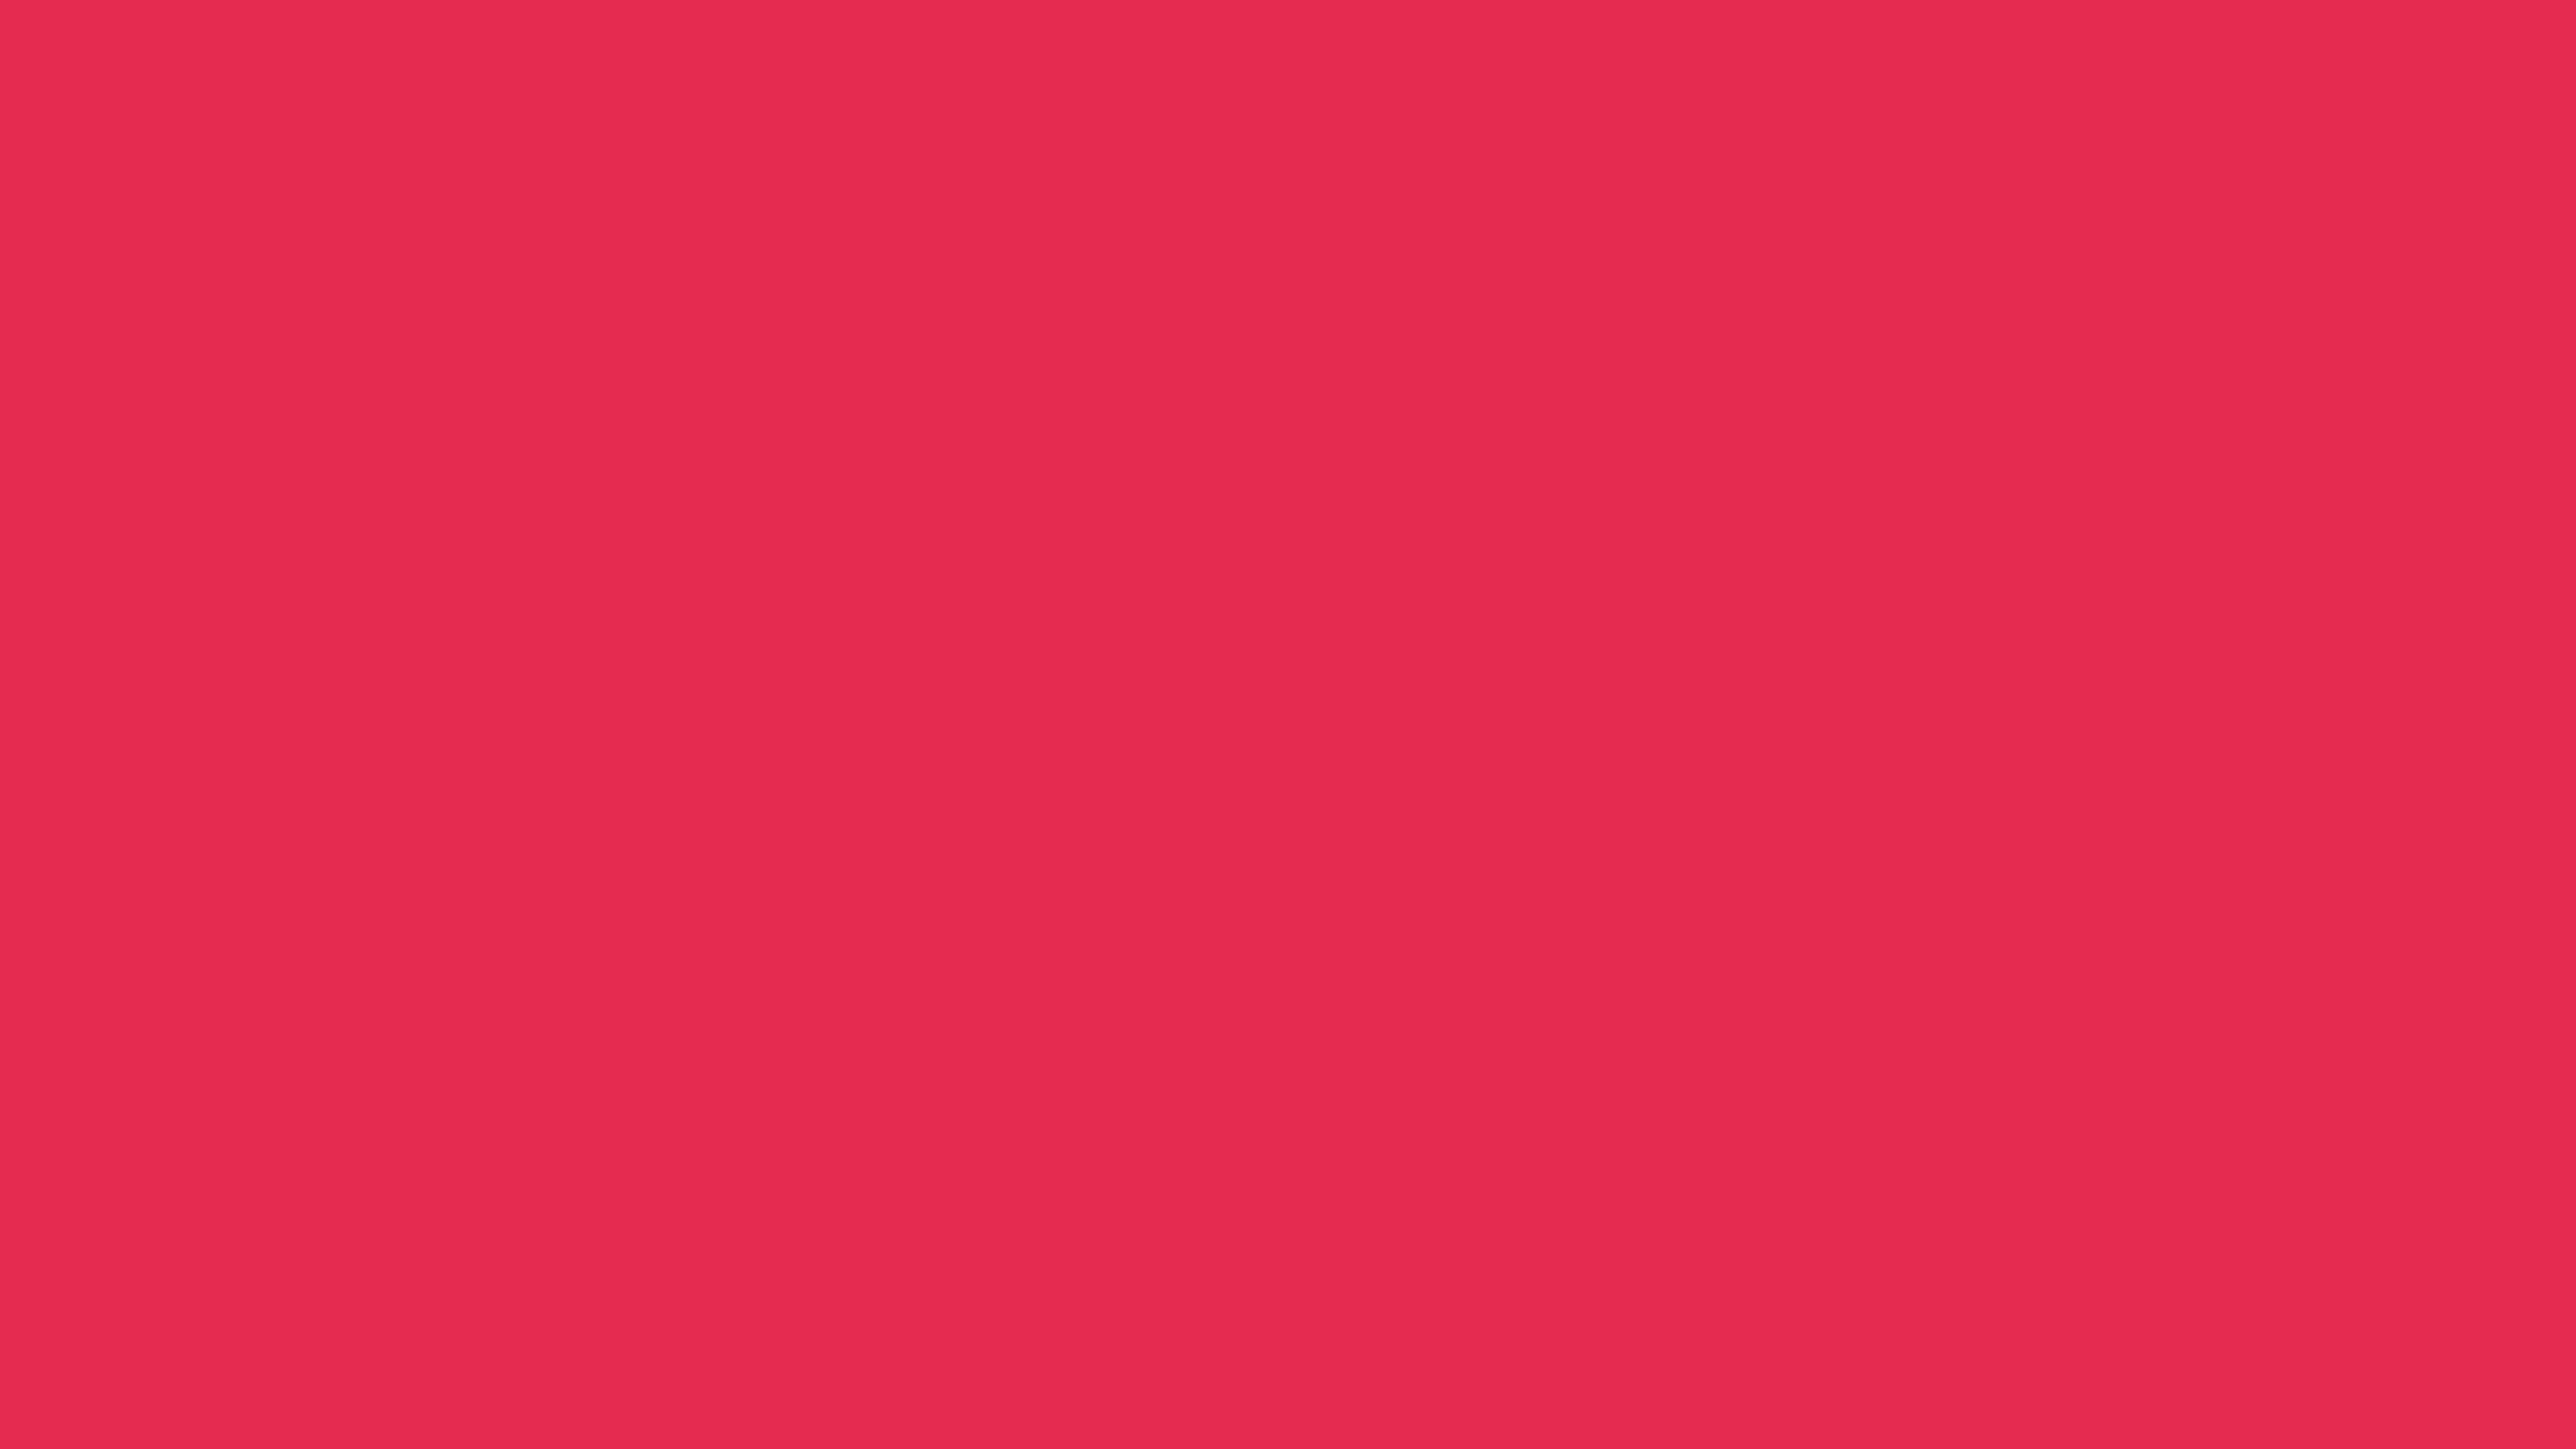 4096x2304 Amaranth Solid Color Background